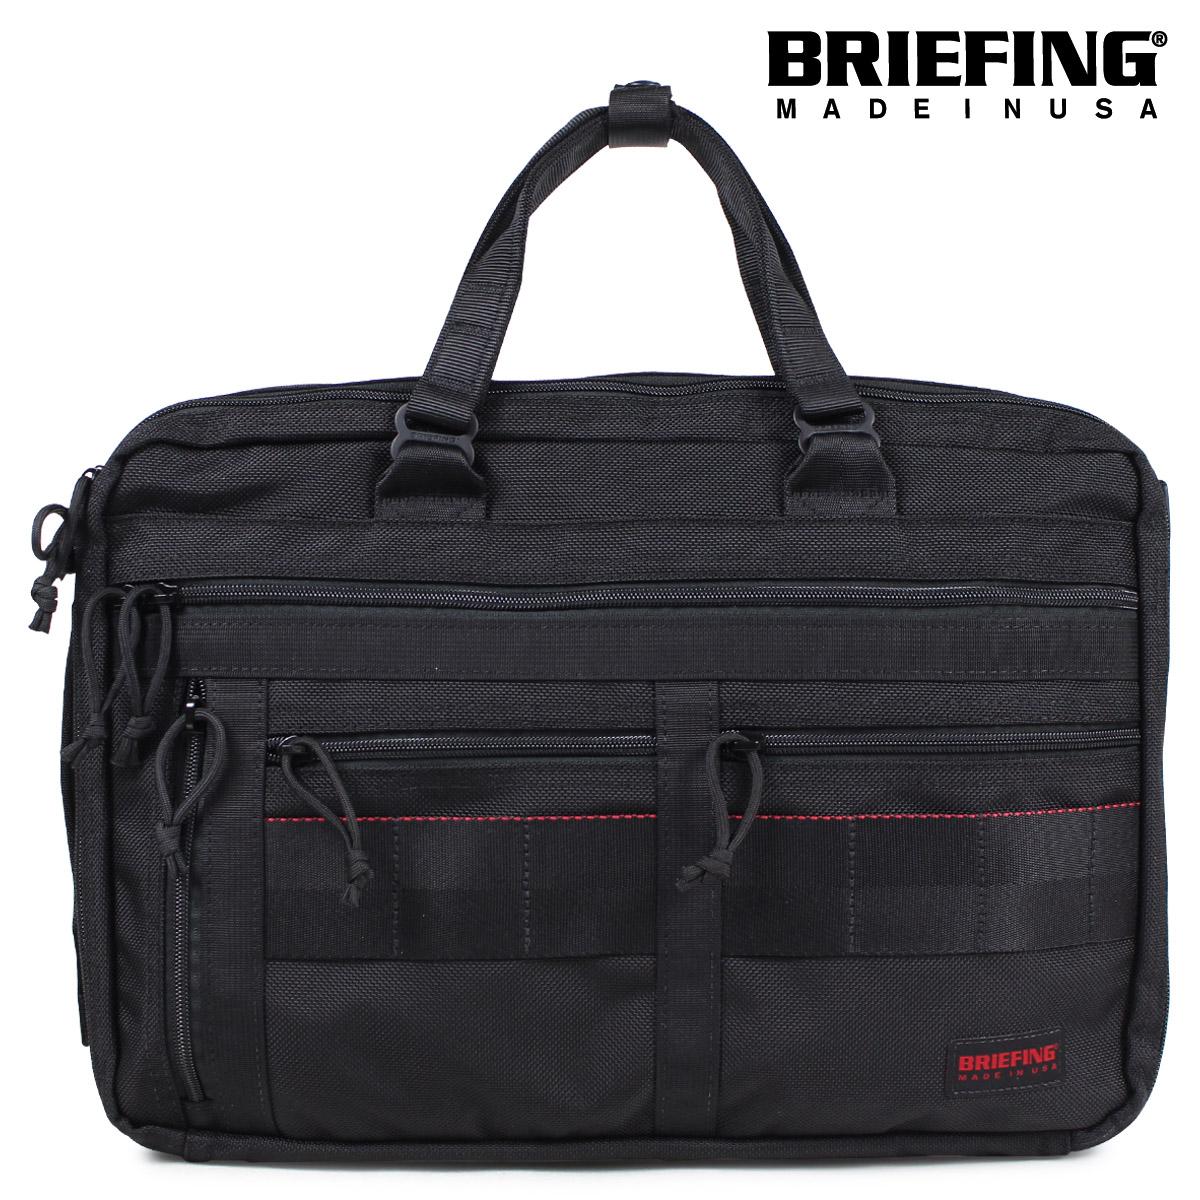 BRIEFING ブリーフィング バッグ 3way ブリーフケース ビジネスバッグ メンズ A4 3 WAY LINER ブラック BRM181401010